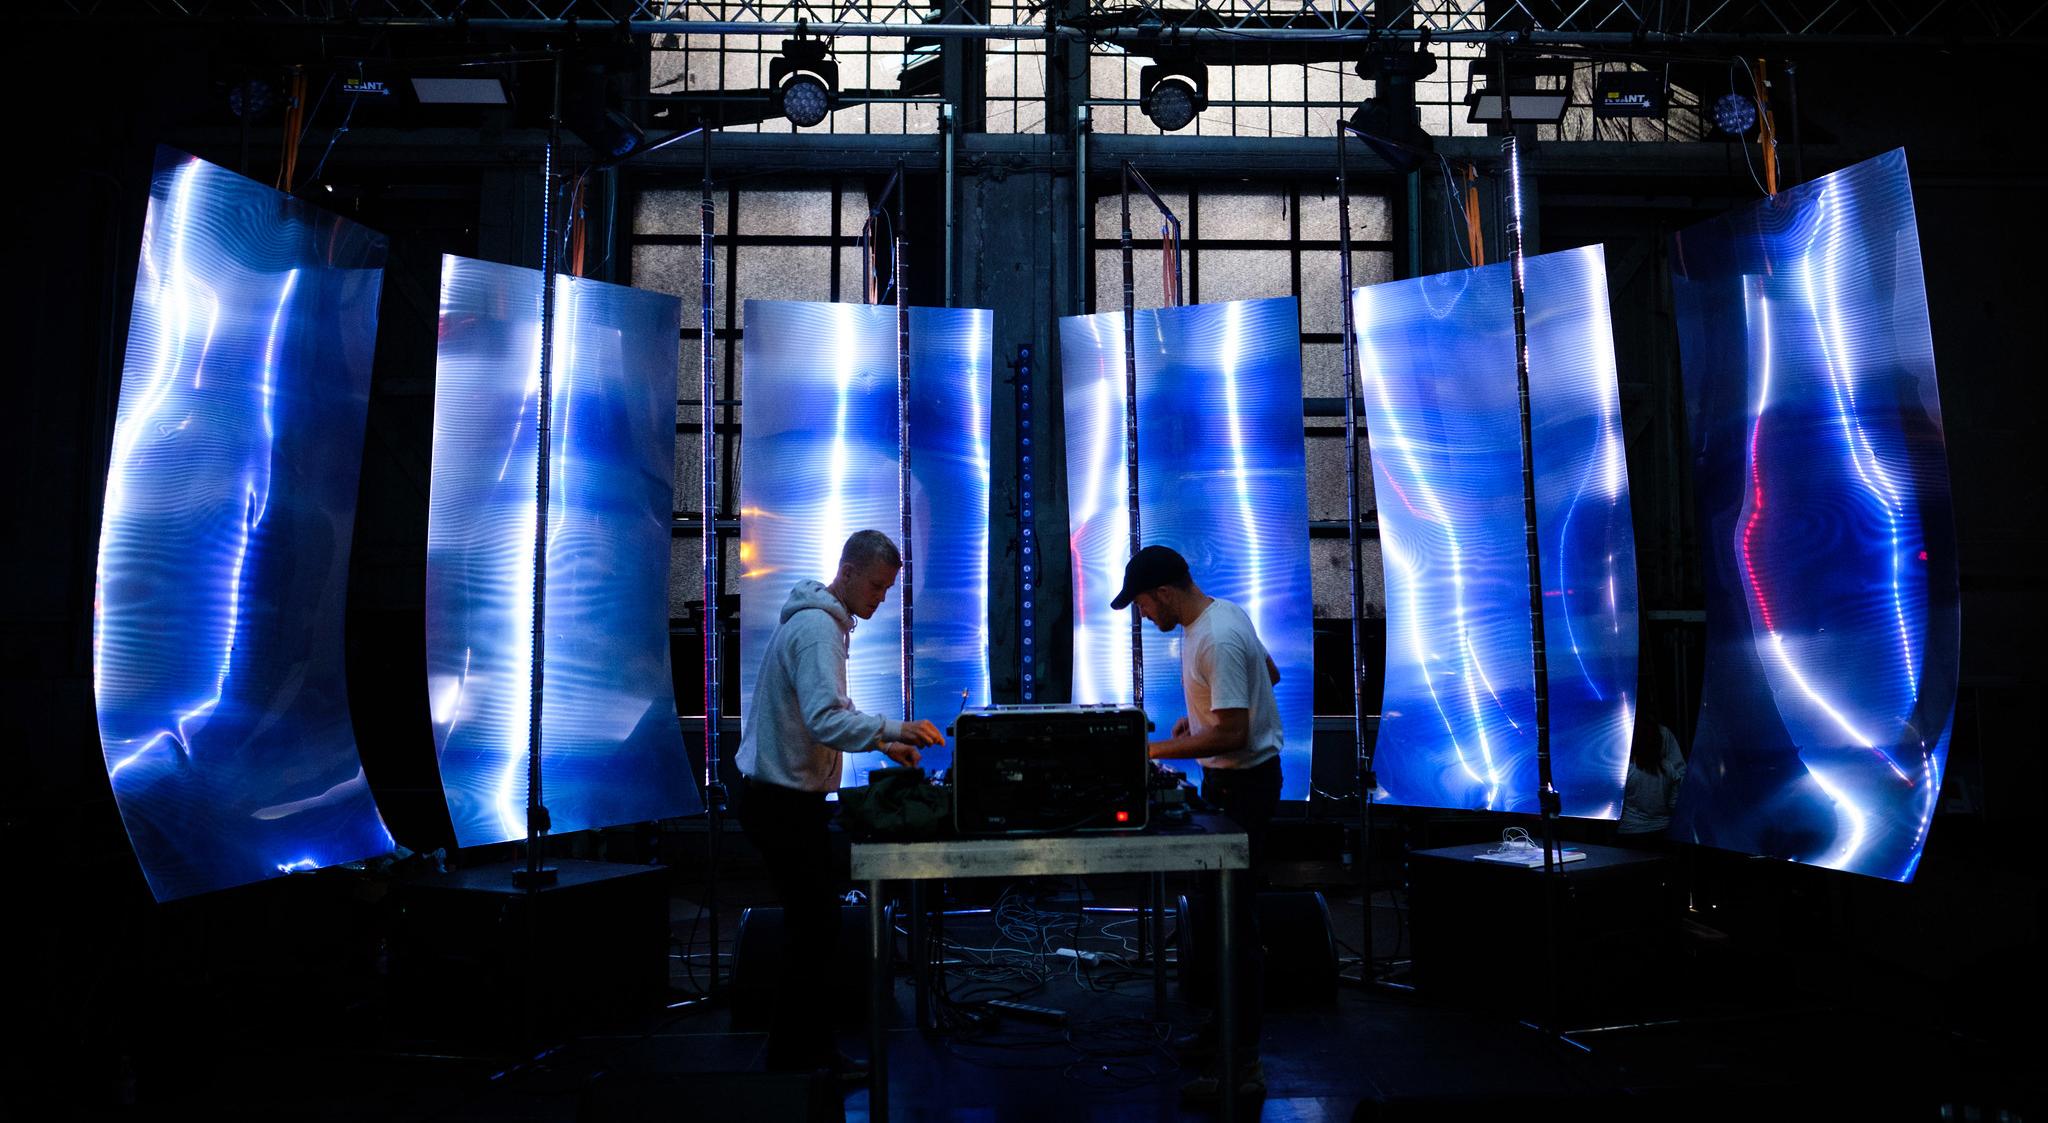 strøm elektronsik musik